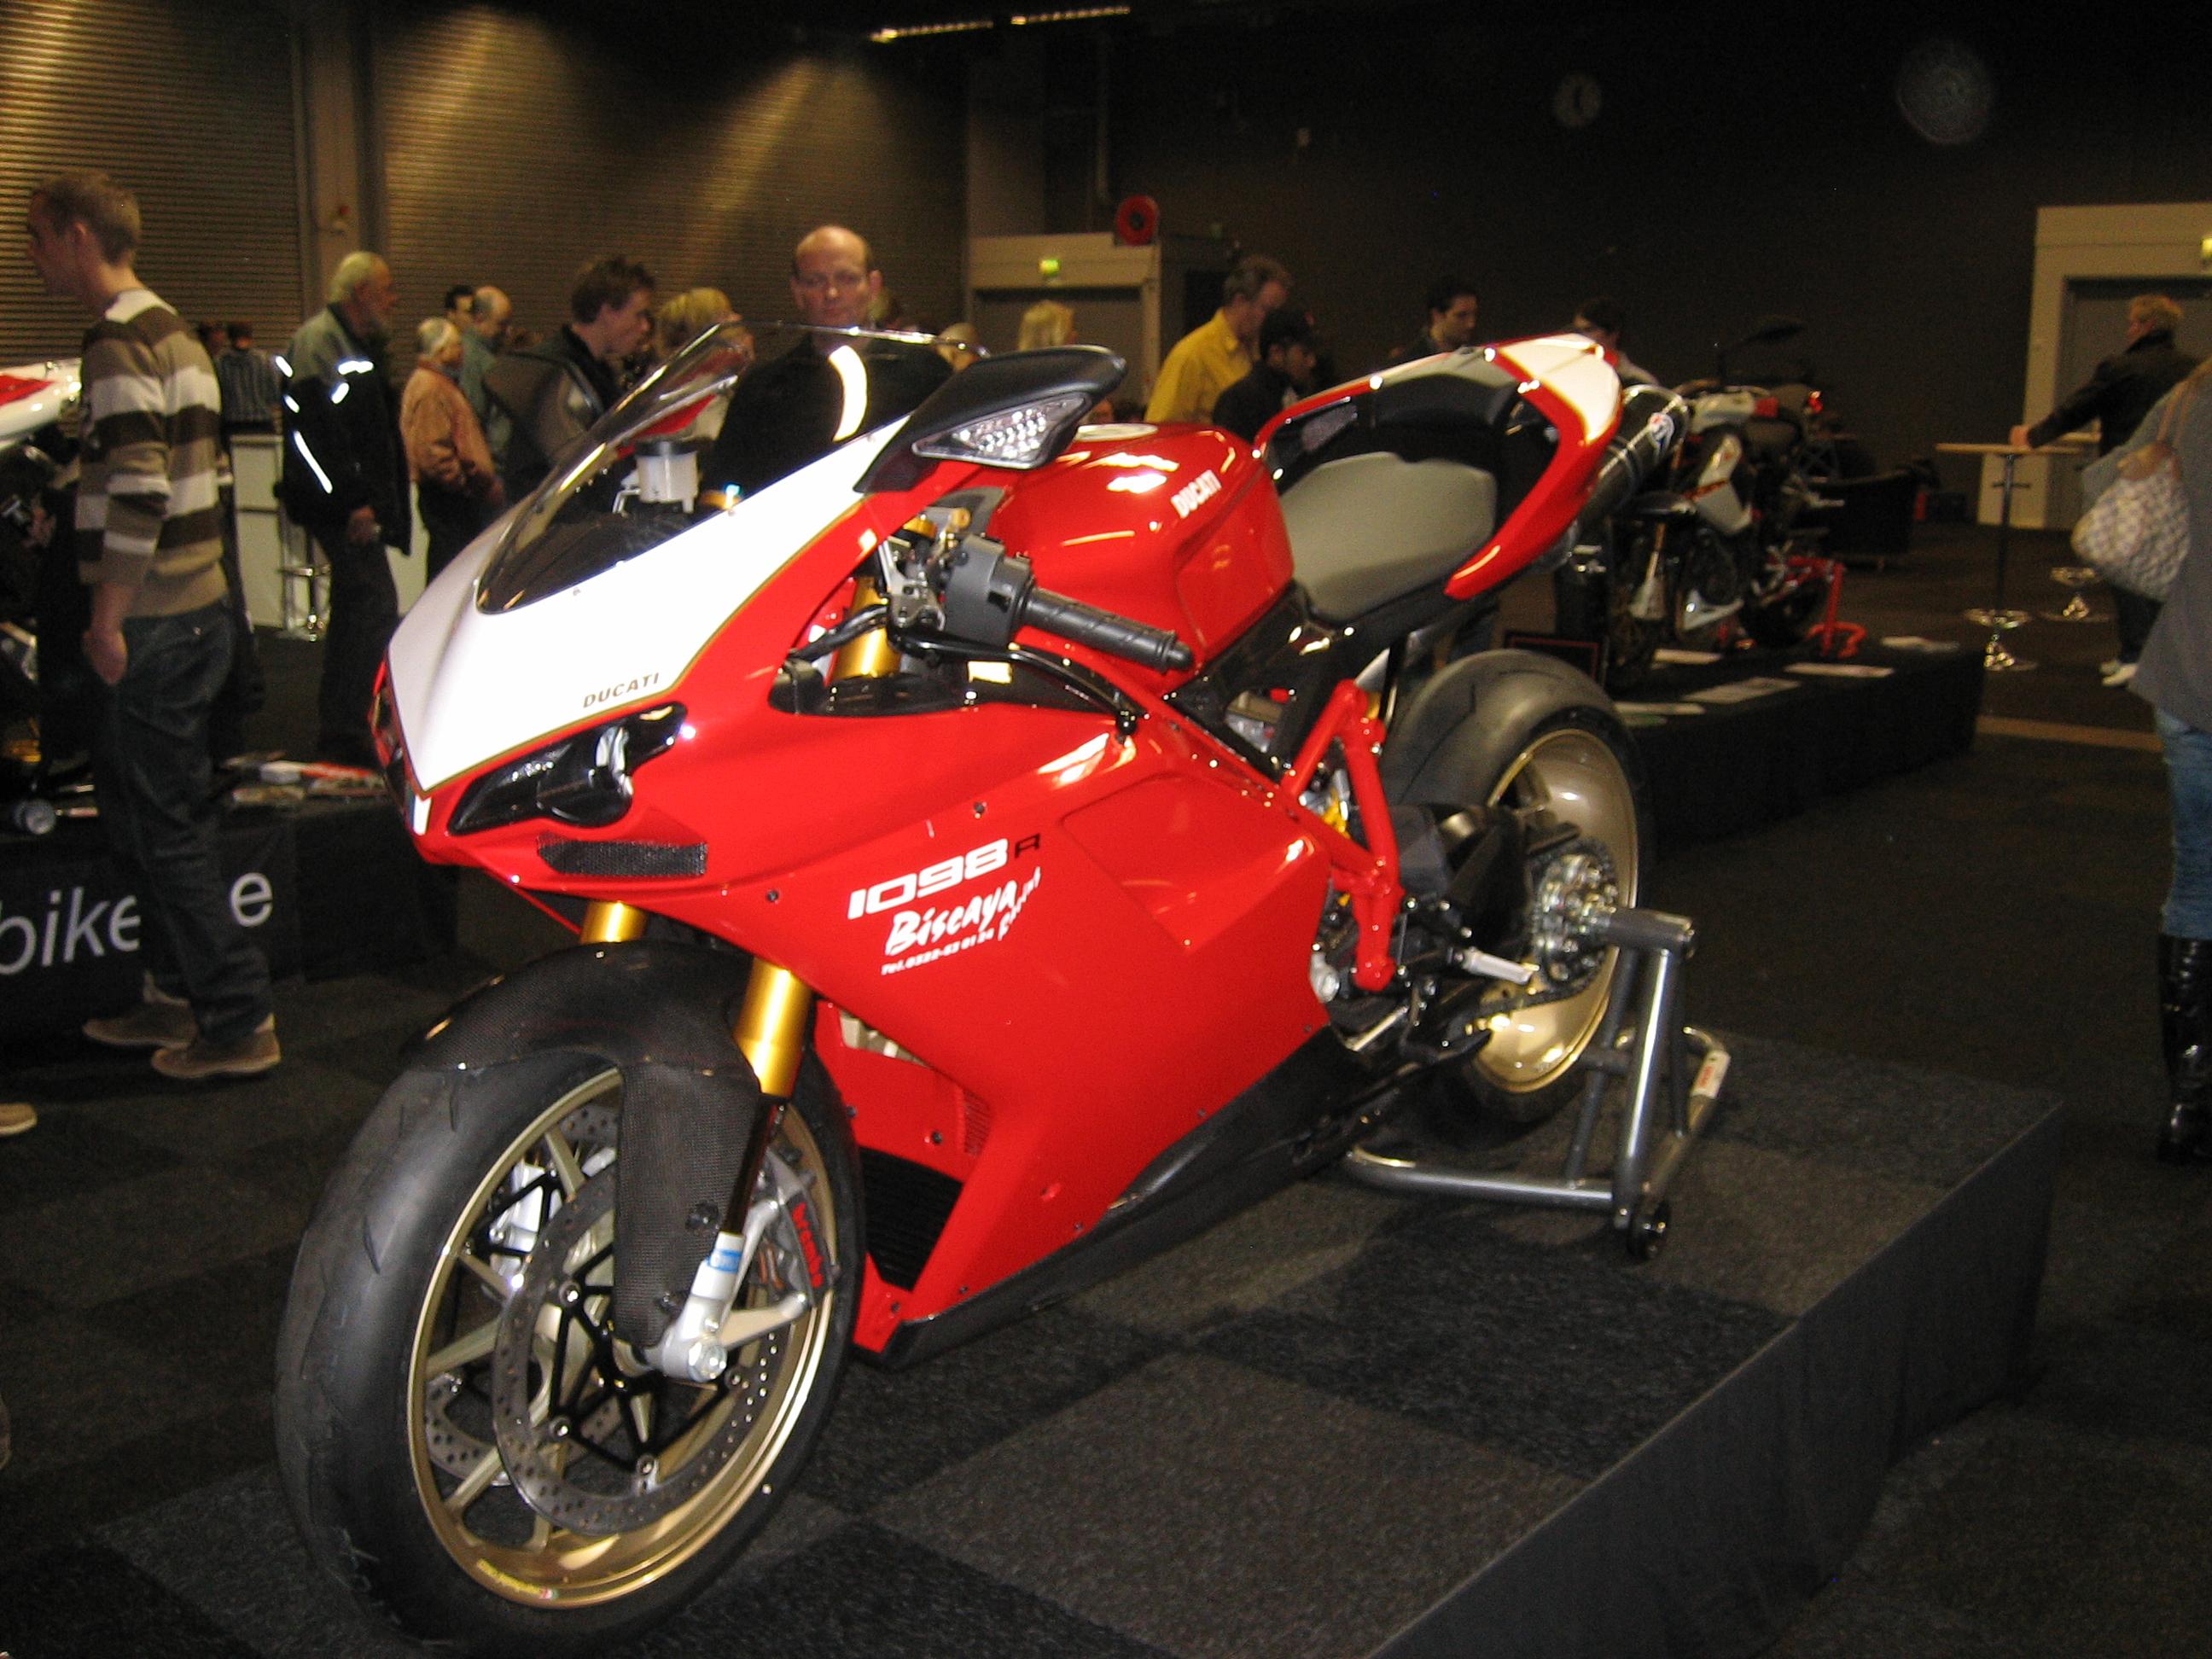 Ducati 1198s Racing Sport Bike: Autopedia, The Free Automobile Encyclopedia